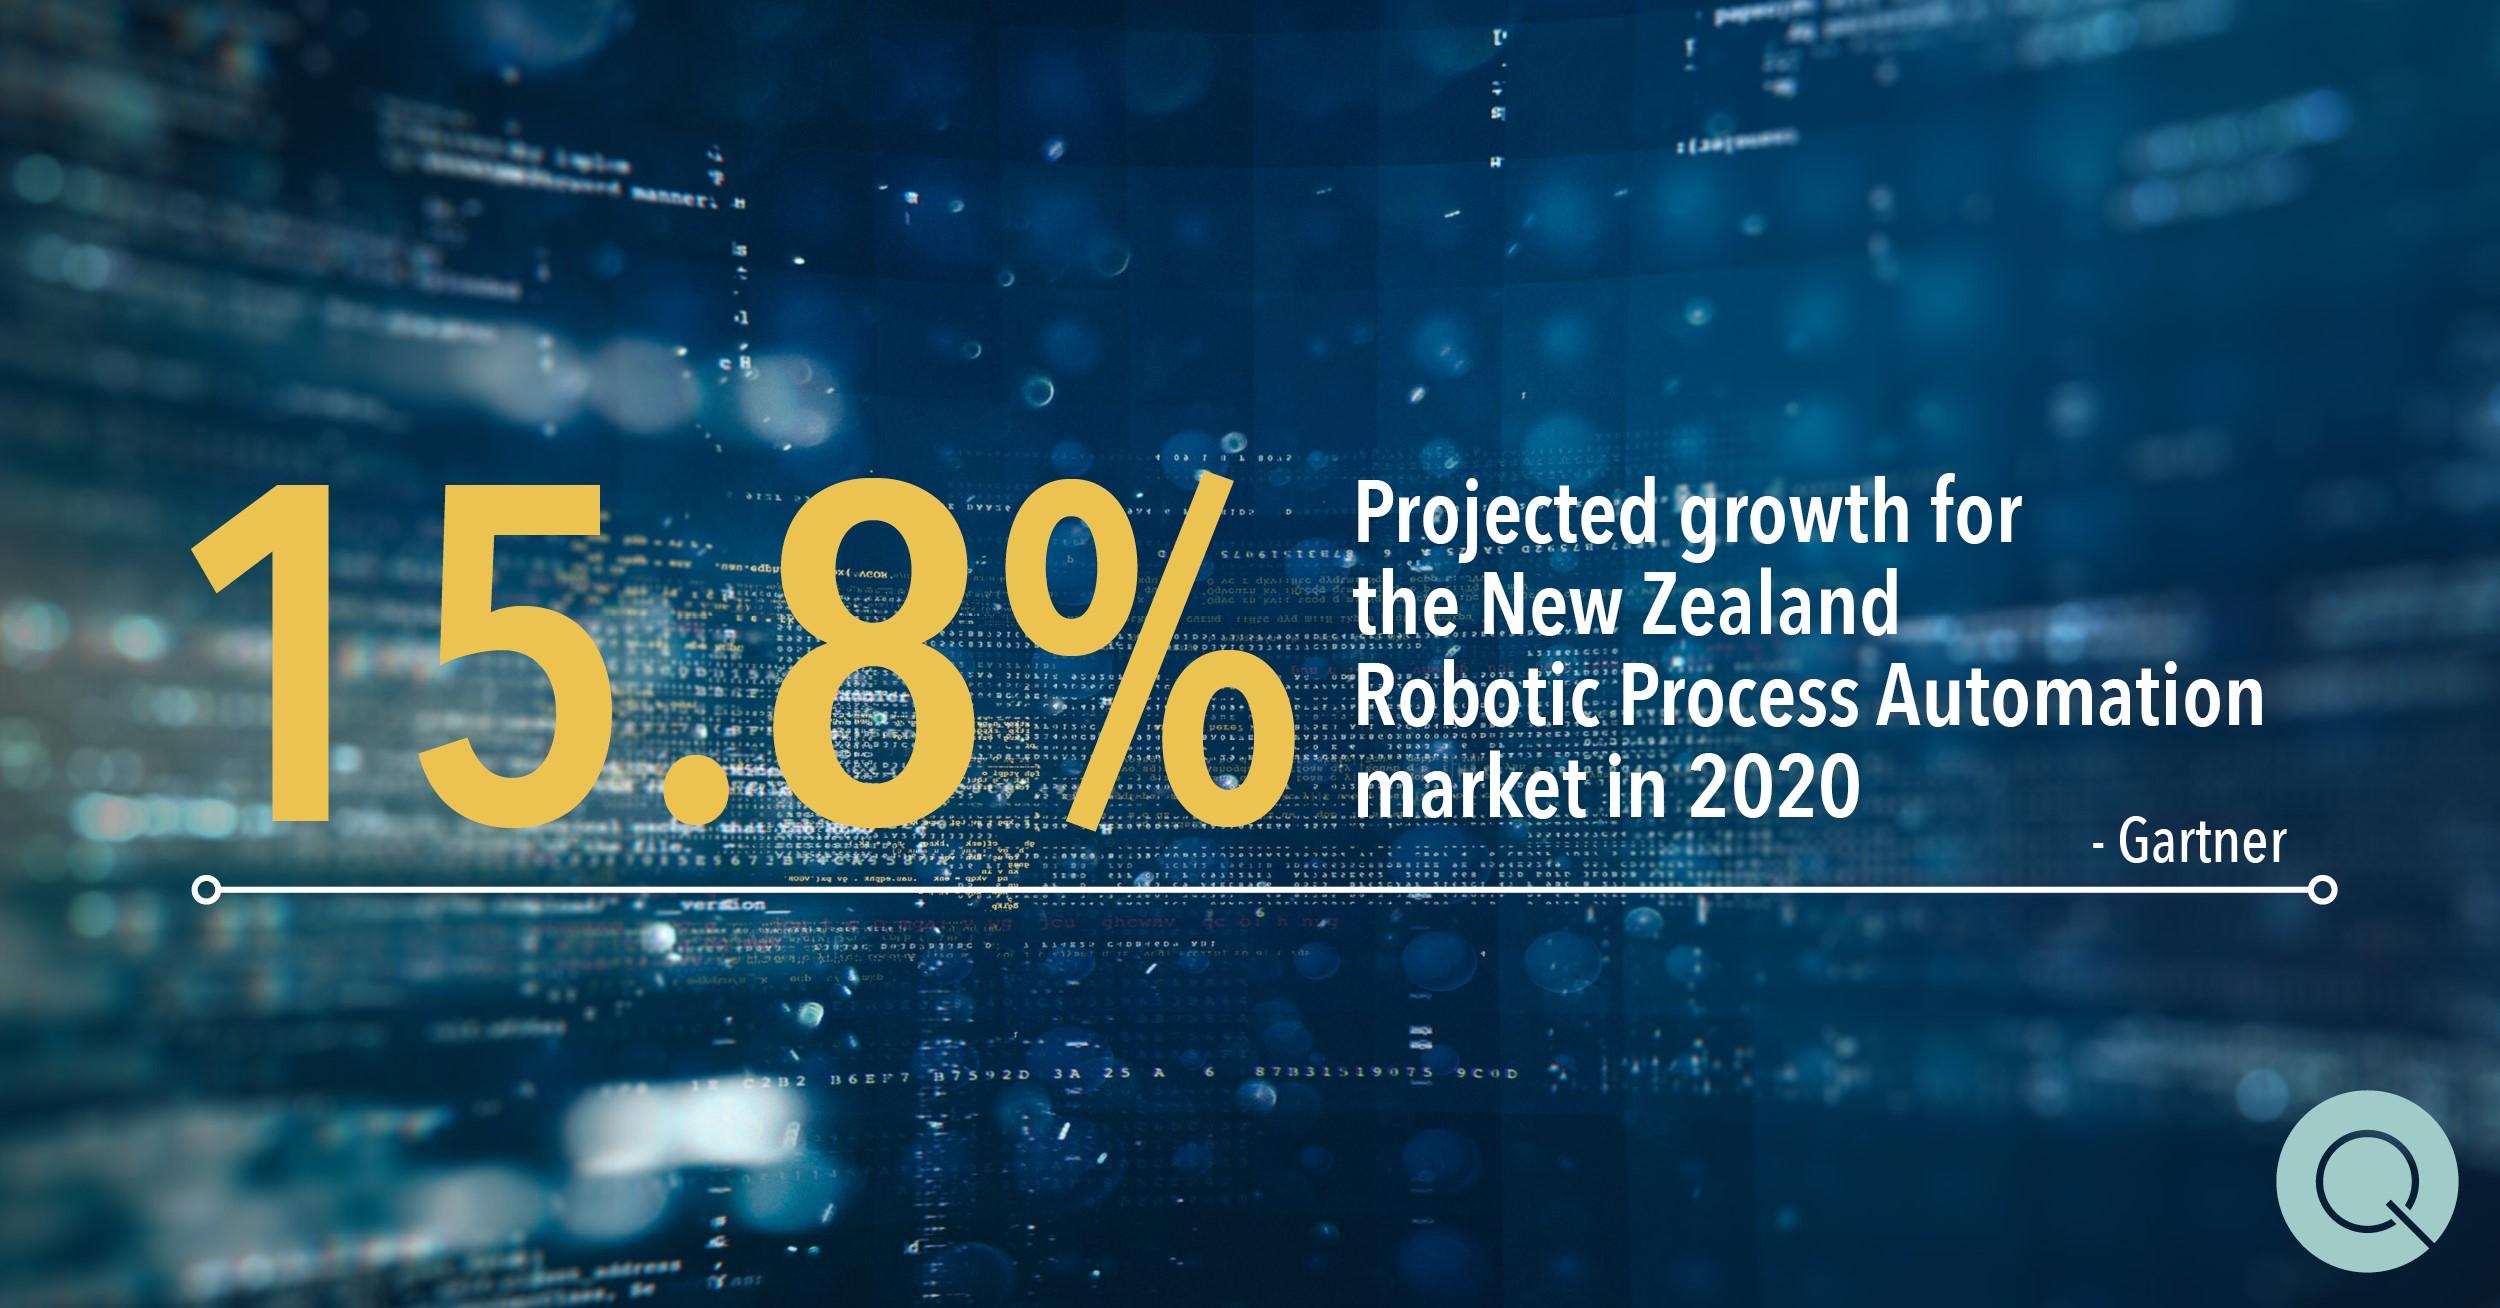 Robotic Process Automation Market Growth